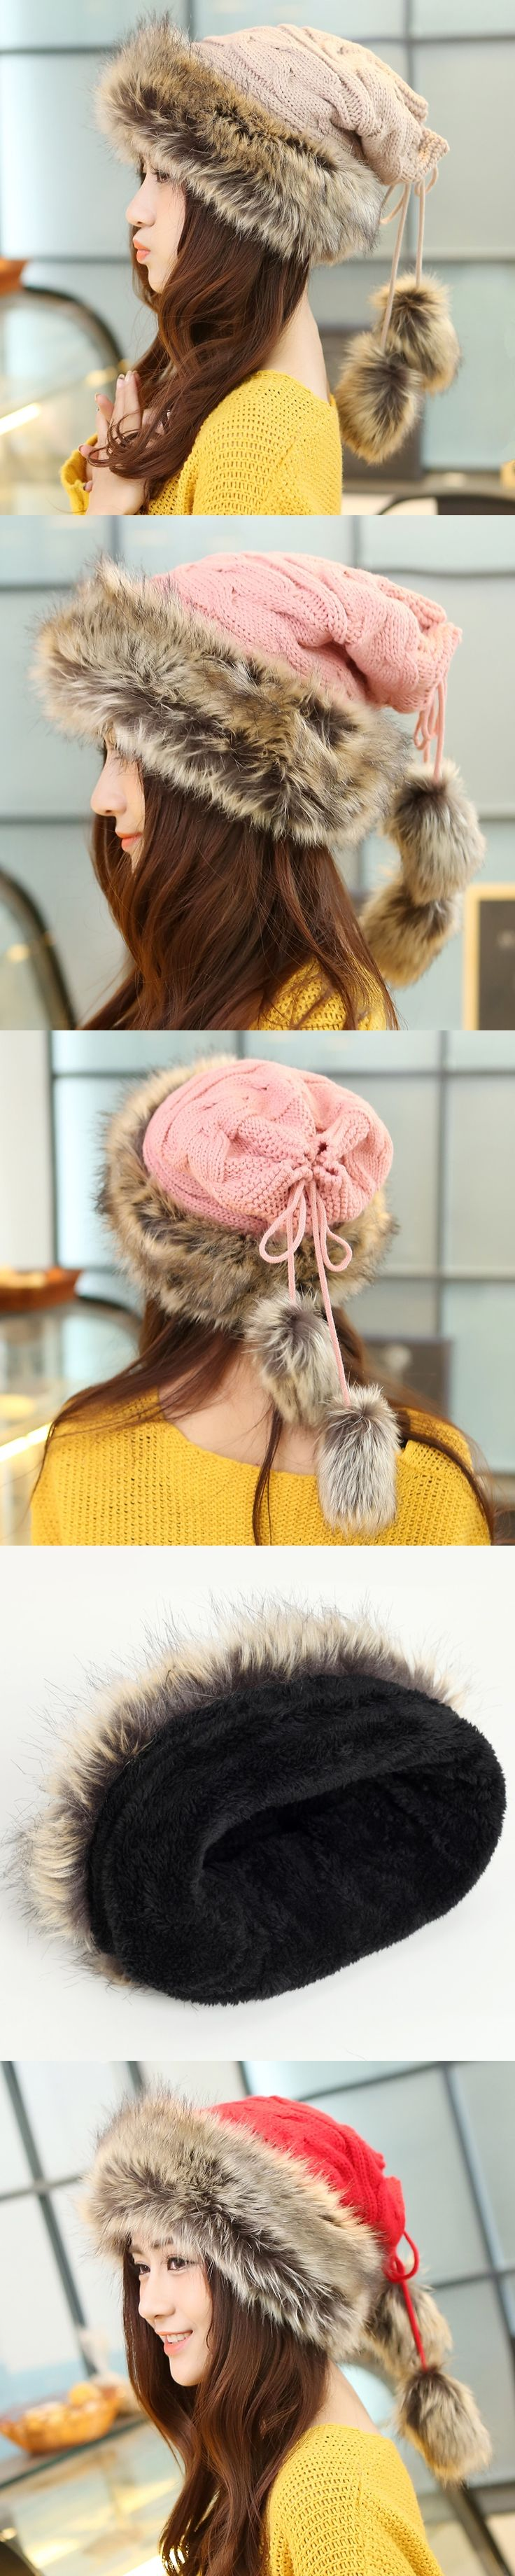 2016 Winter Hat Women Fur Cap Warm Plus Velvet Dual Use Hats For Women Thicken Knitting Caps Ladies Winter Beanie Wool Hat